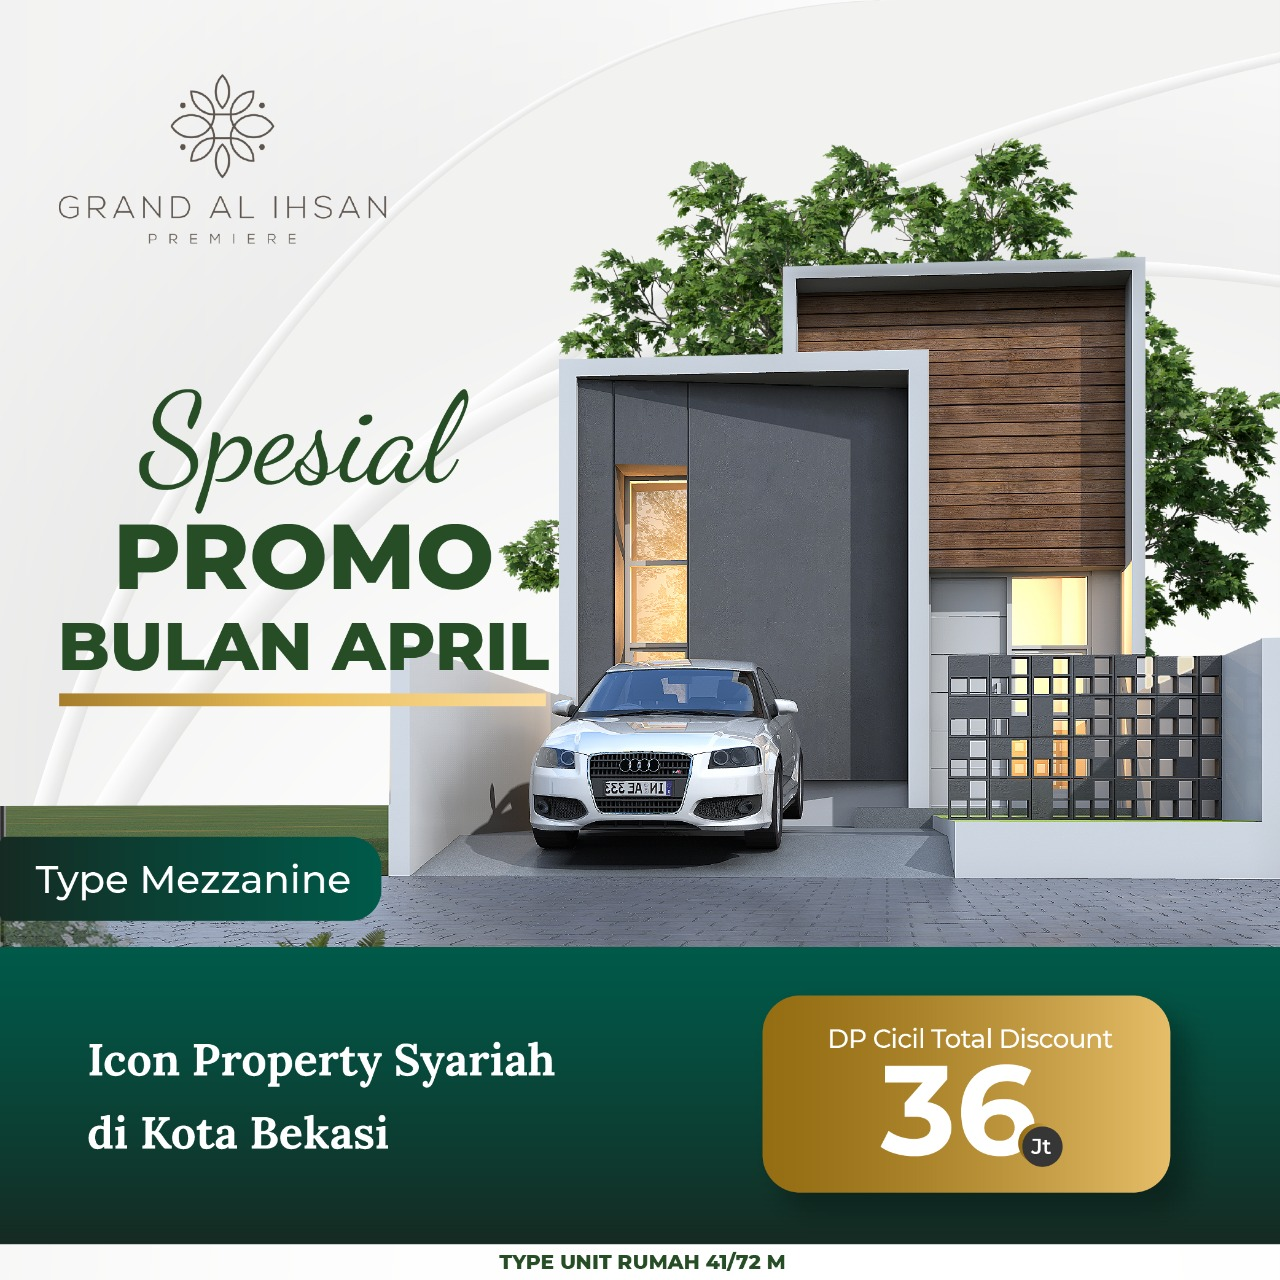 perumahan syariah bekasi - terbesar pertama - promo dp cicil april 2021 mezzanine 41-72 - gap grand al ihsan premiere